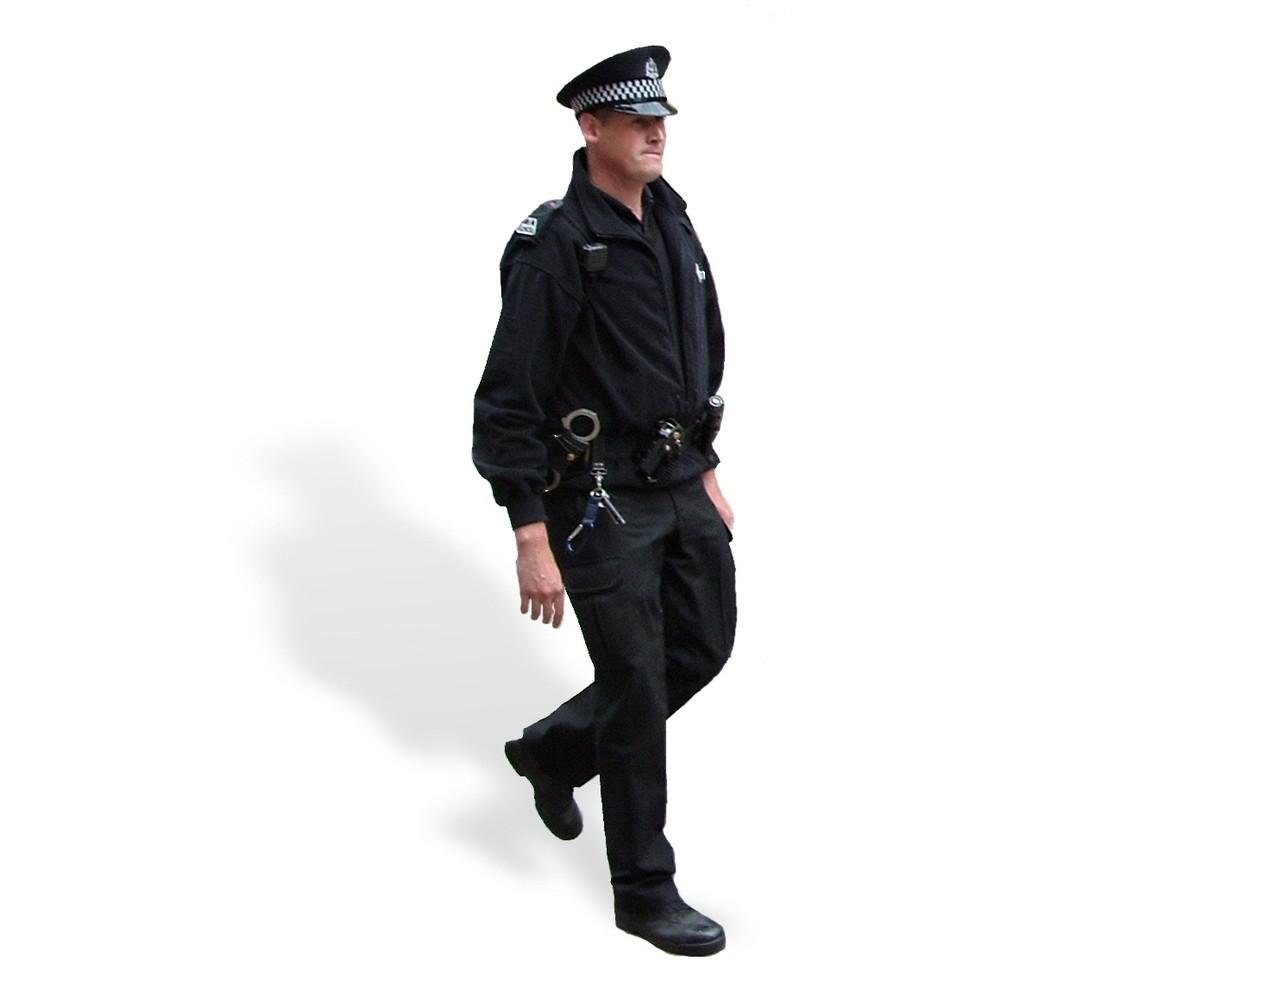 Typ strażnika